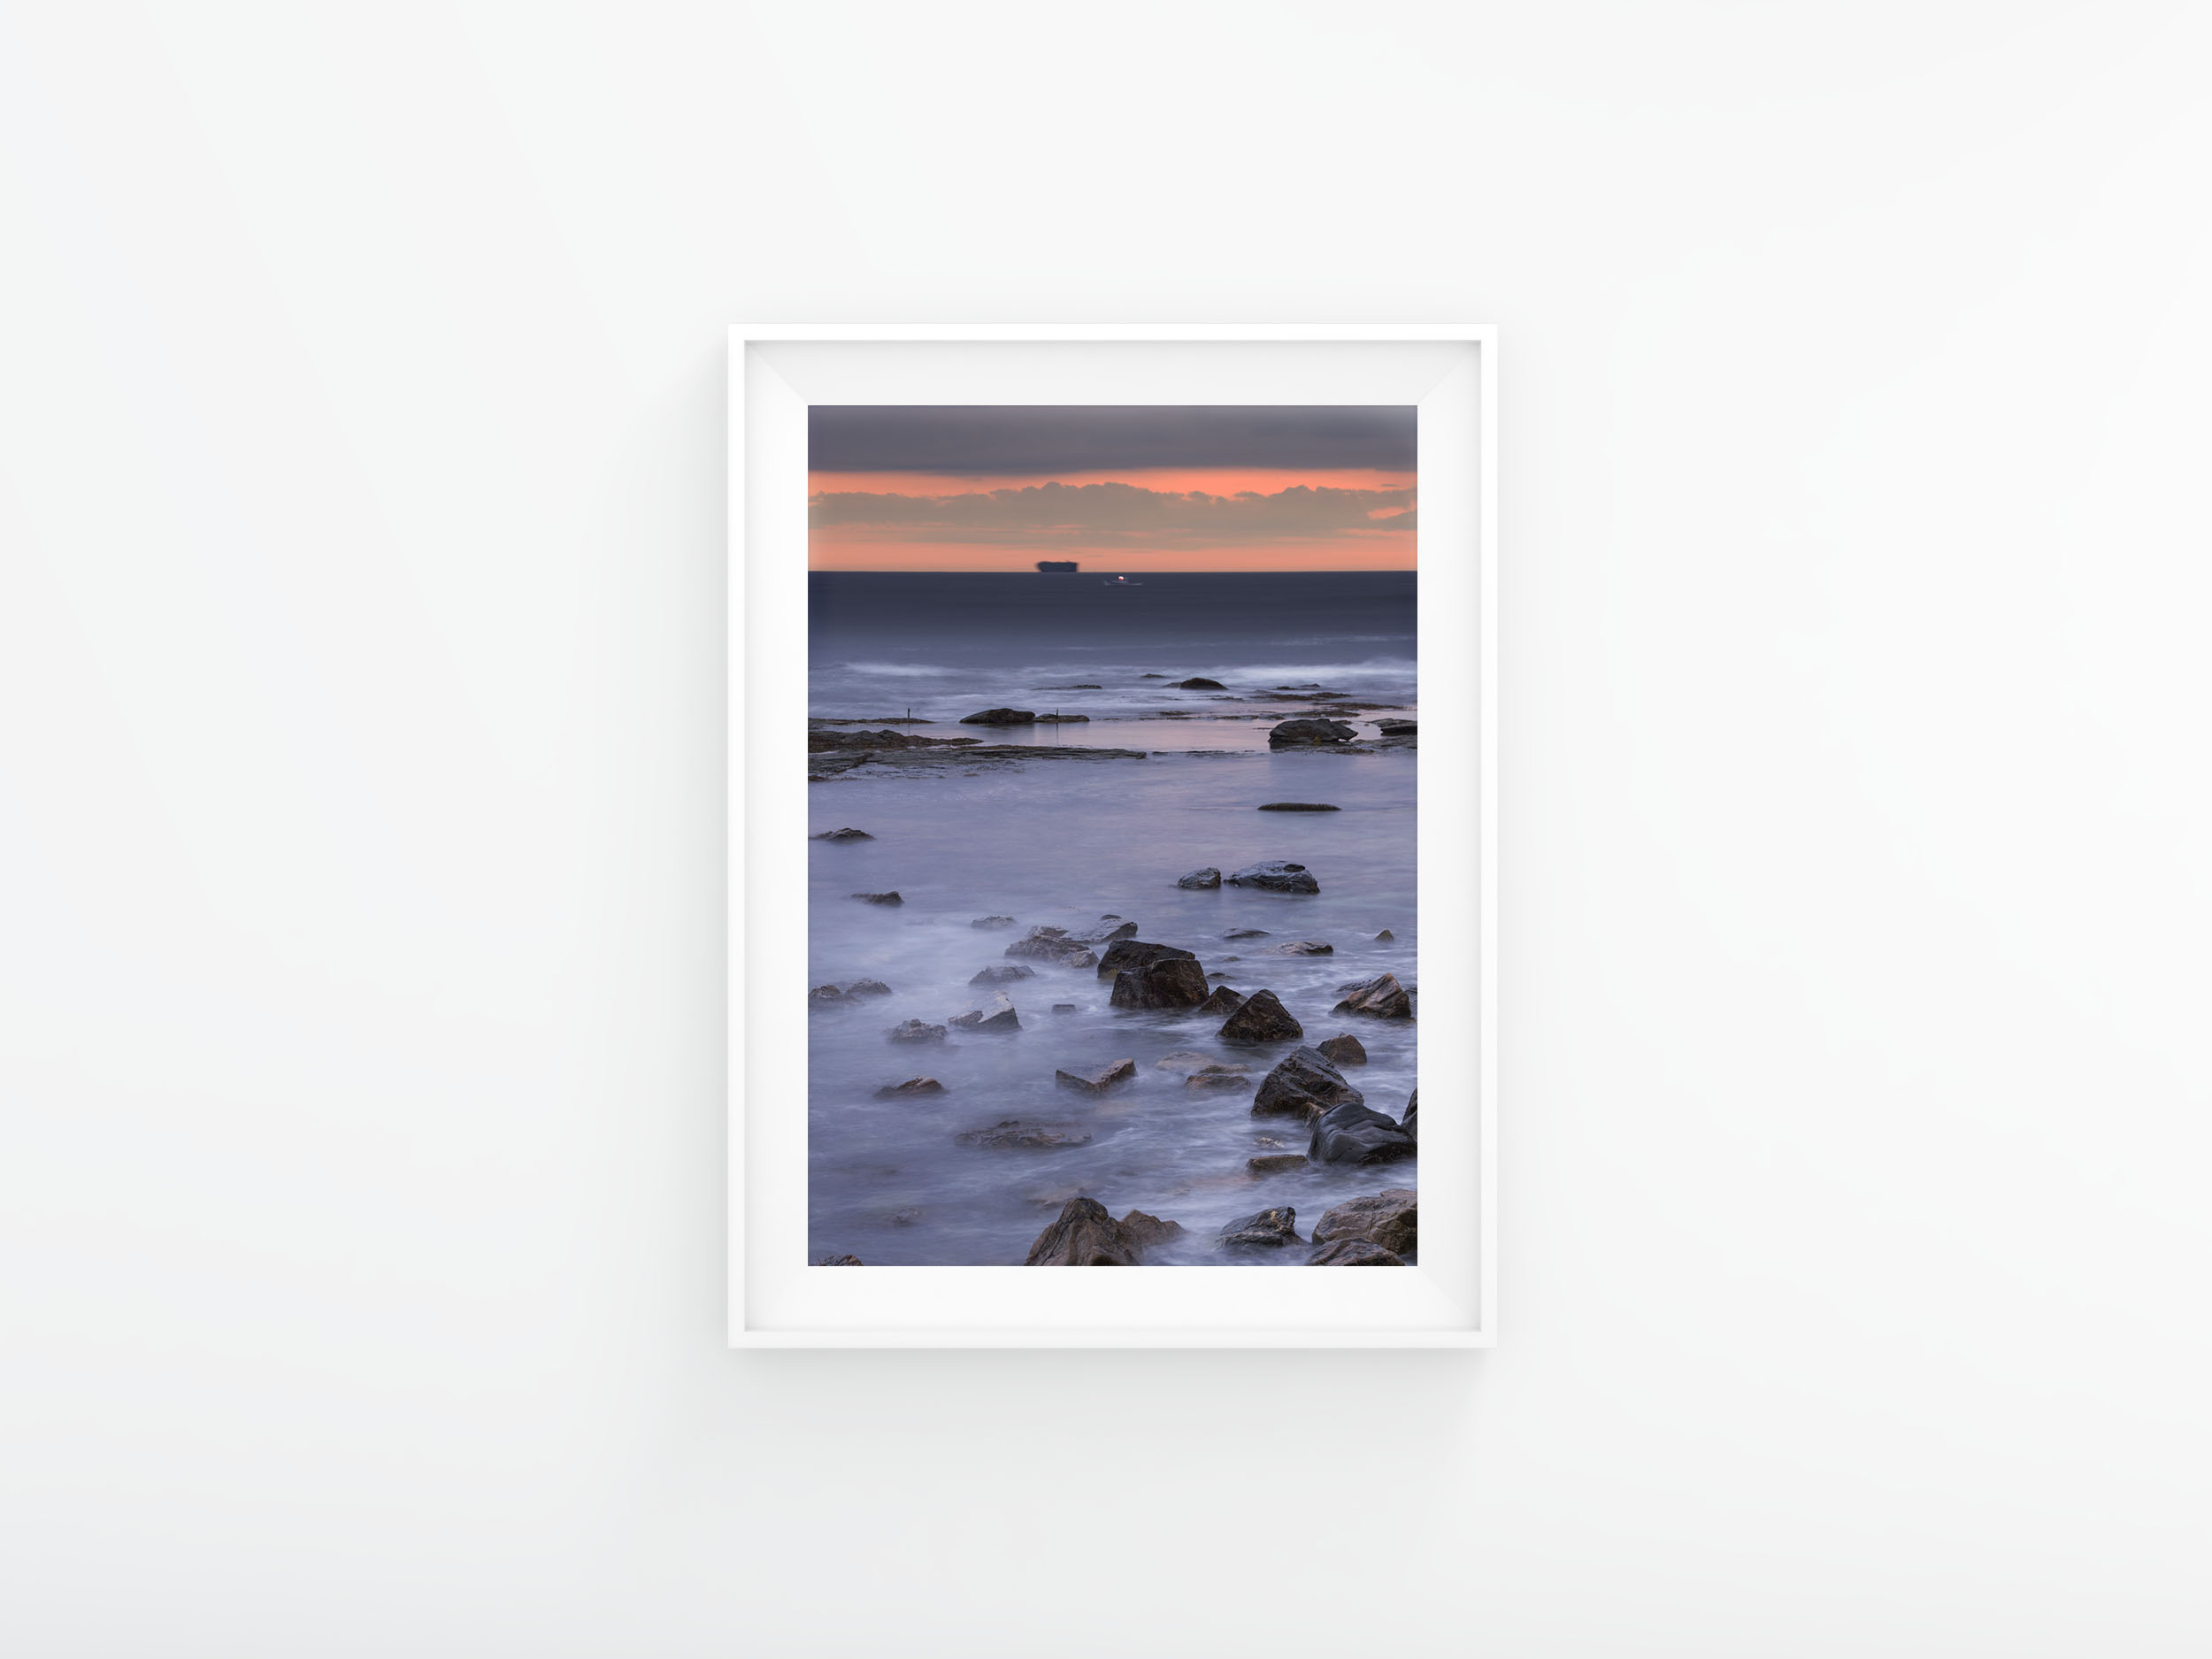 mbp_framed image_1.jpg